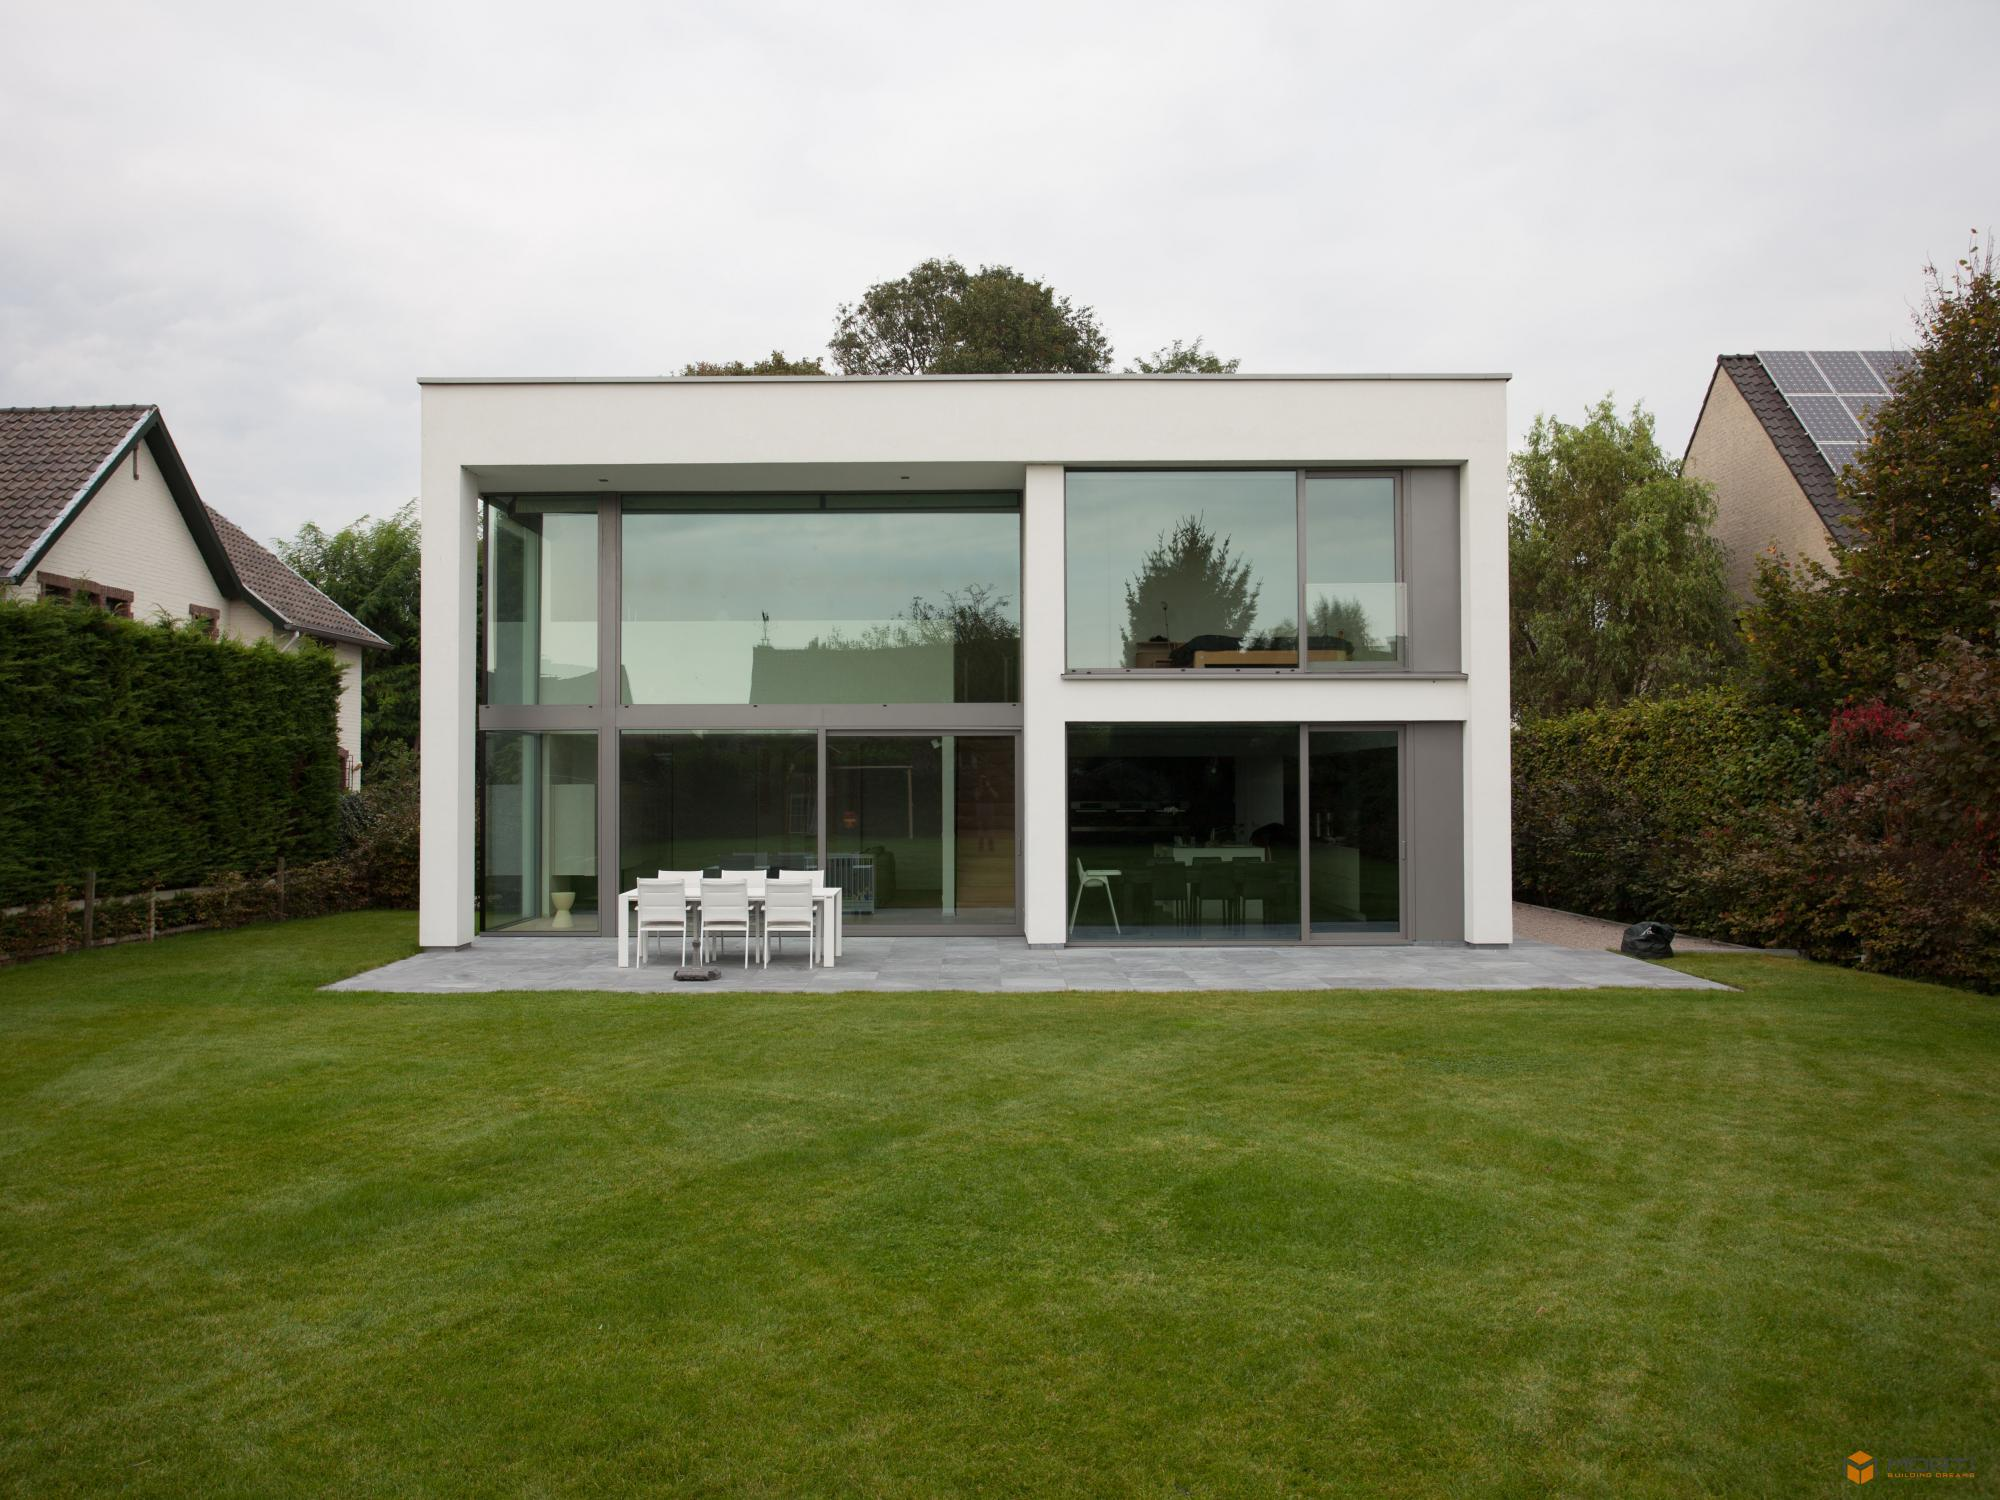 Woningbouw in moderne stijl for Huizen moderne stijl